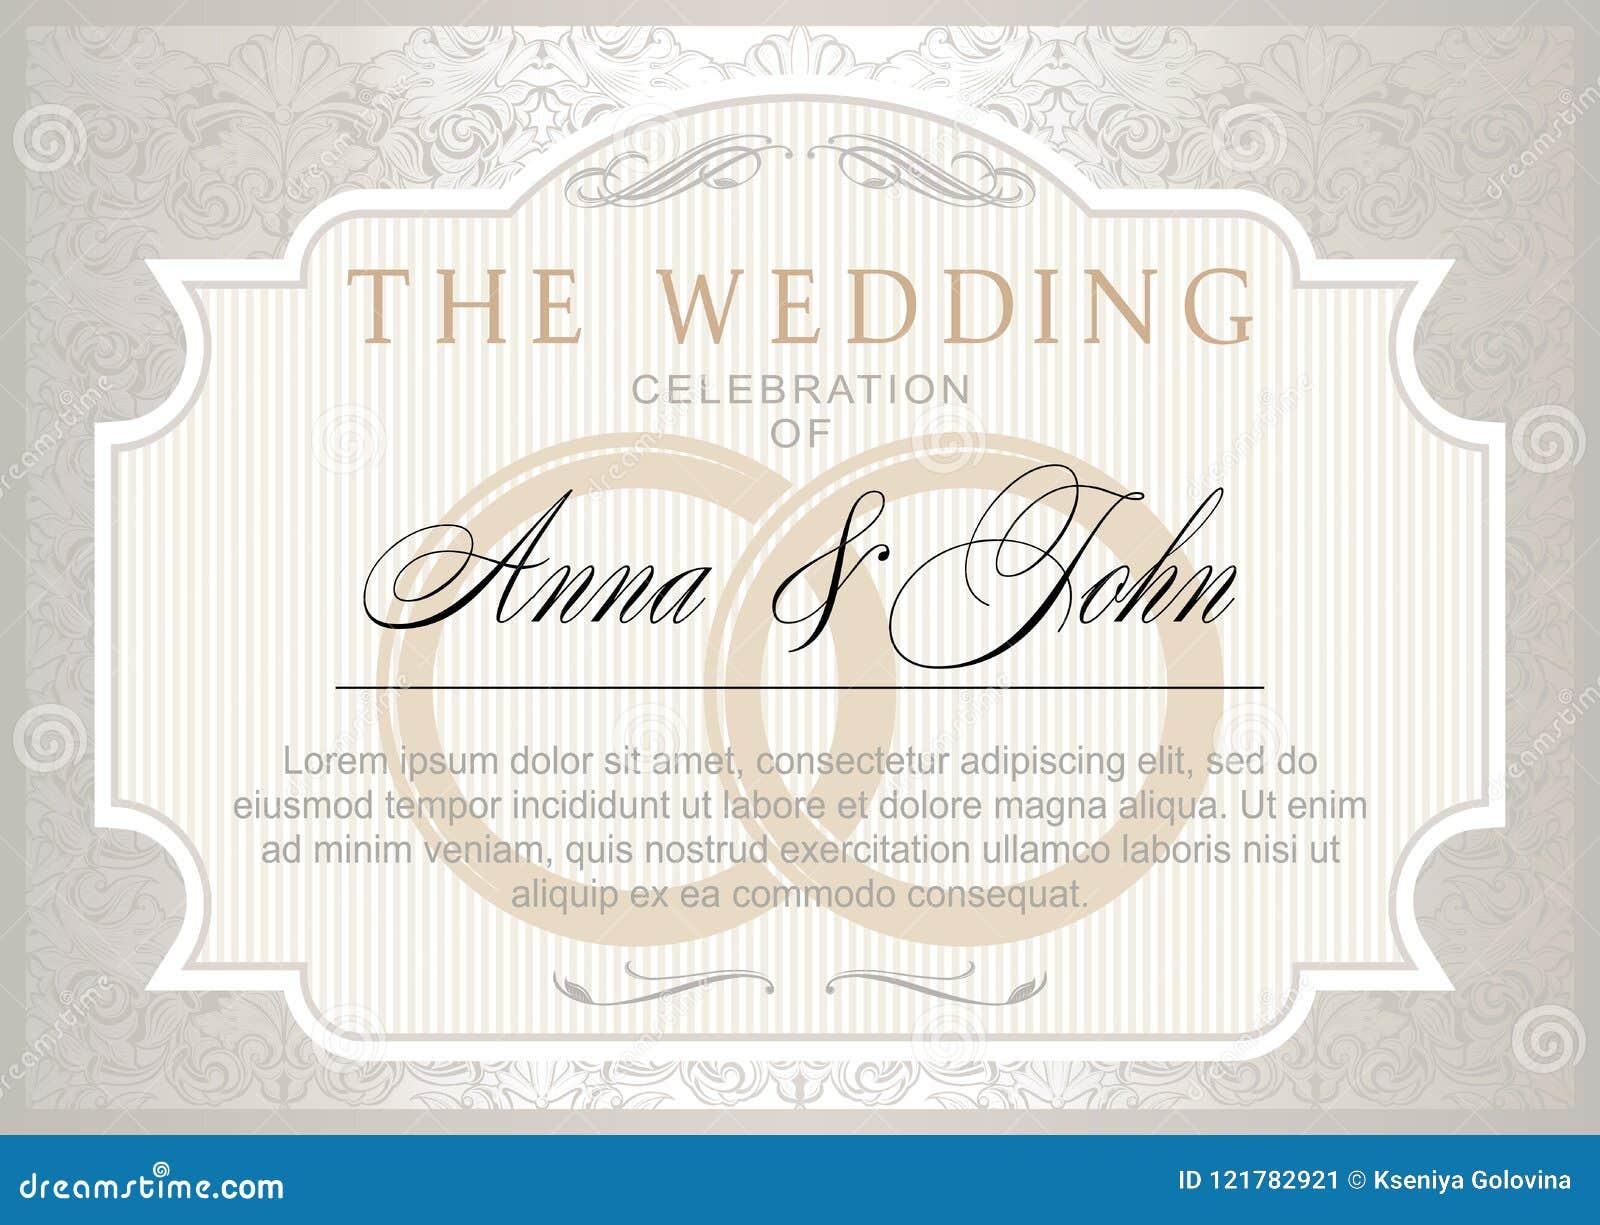 Vintage Wedding Invitation Template Stock Vector - Illustration of ...